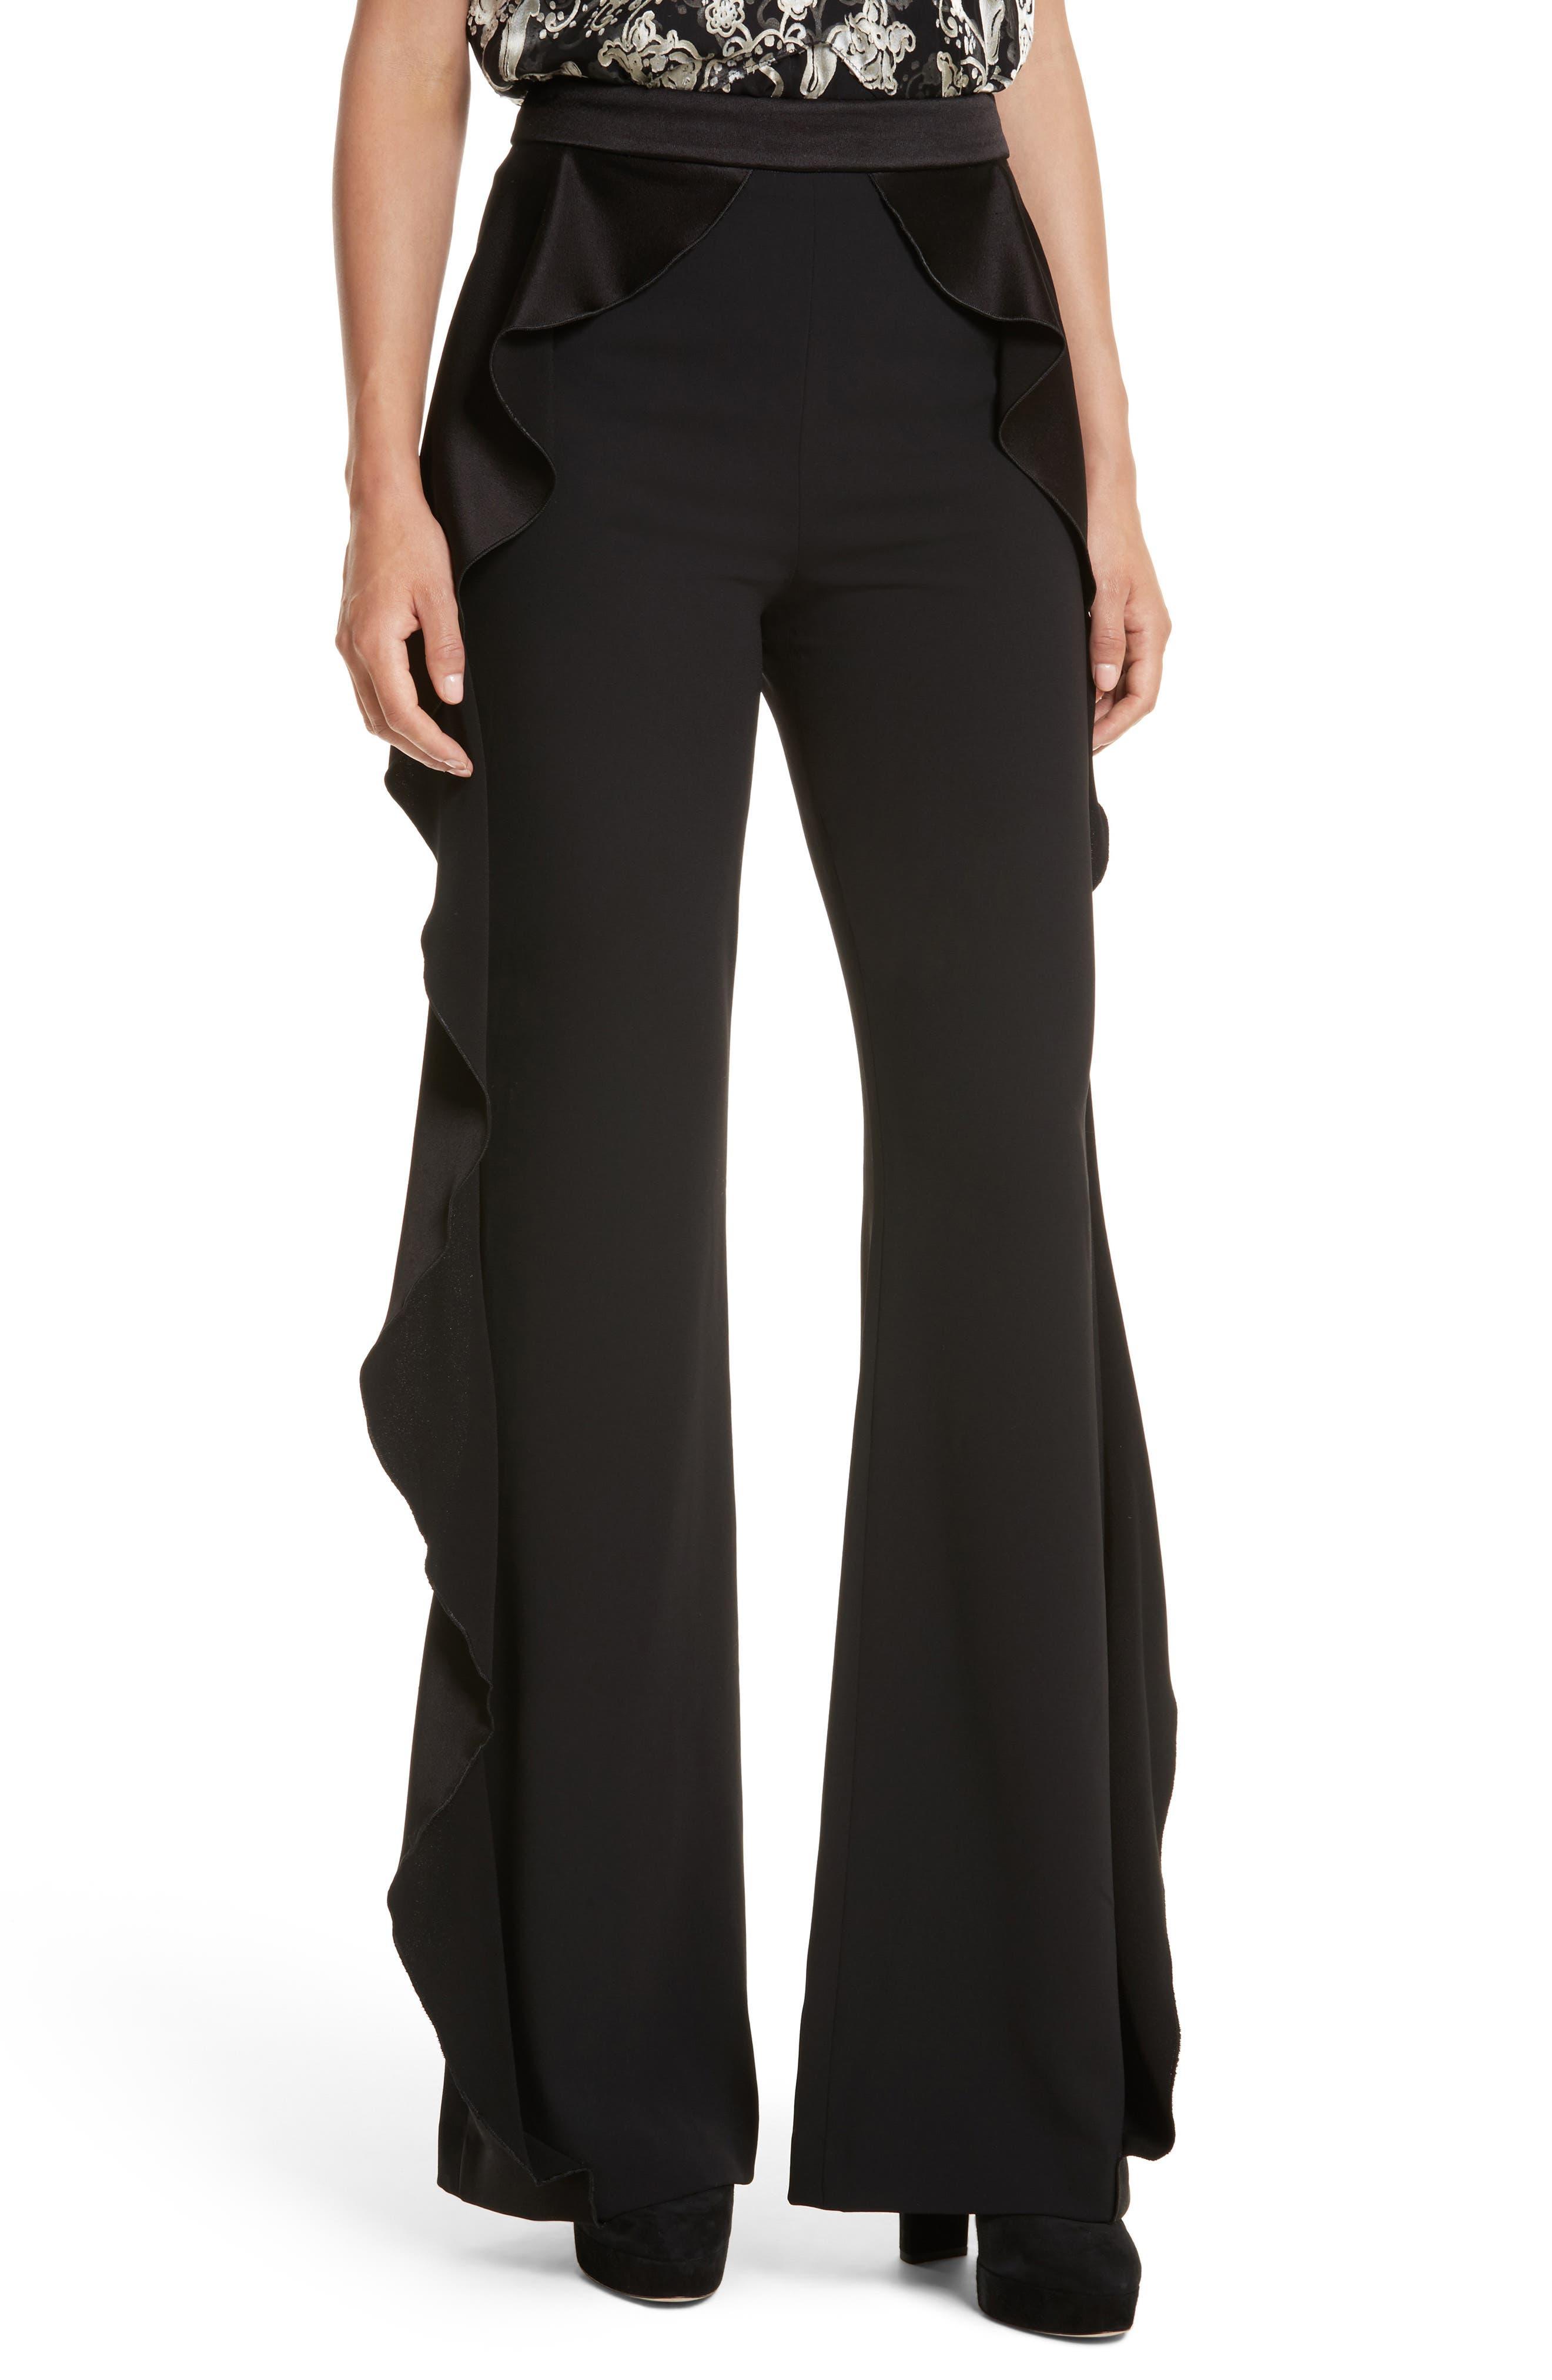 Alternate Image 1 Selected - Alice + Olivia Wallace Side Ruffle High Waist Pants